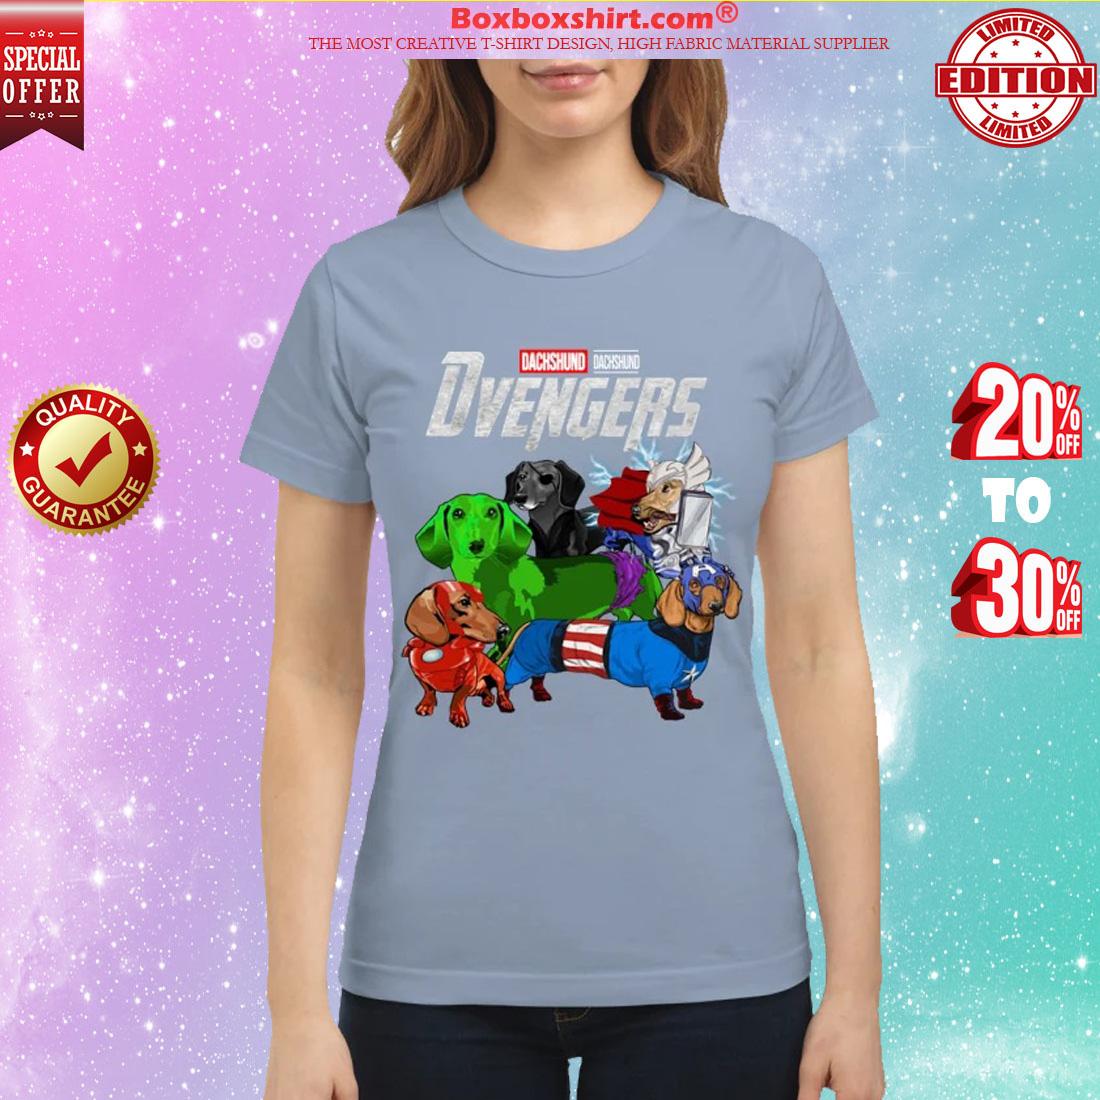 Dachshund Devengers avenger classic shirt